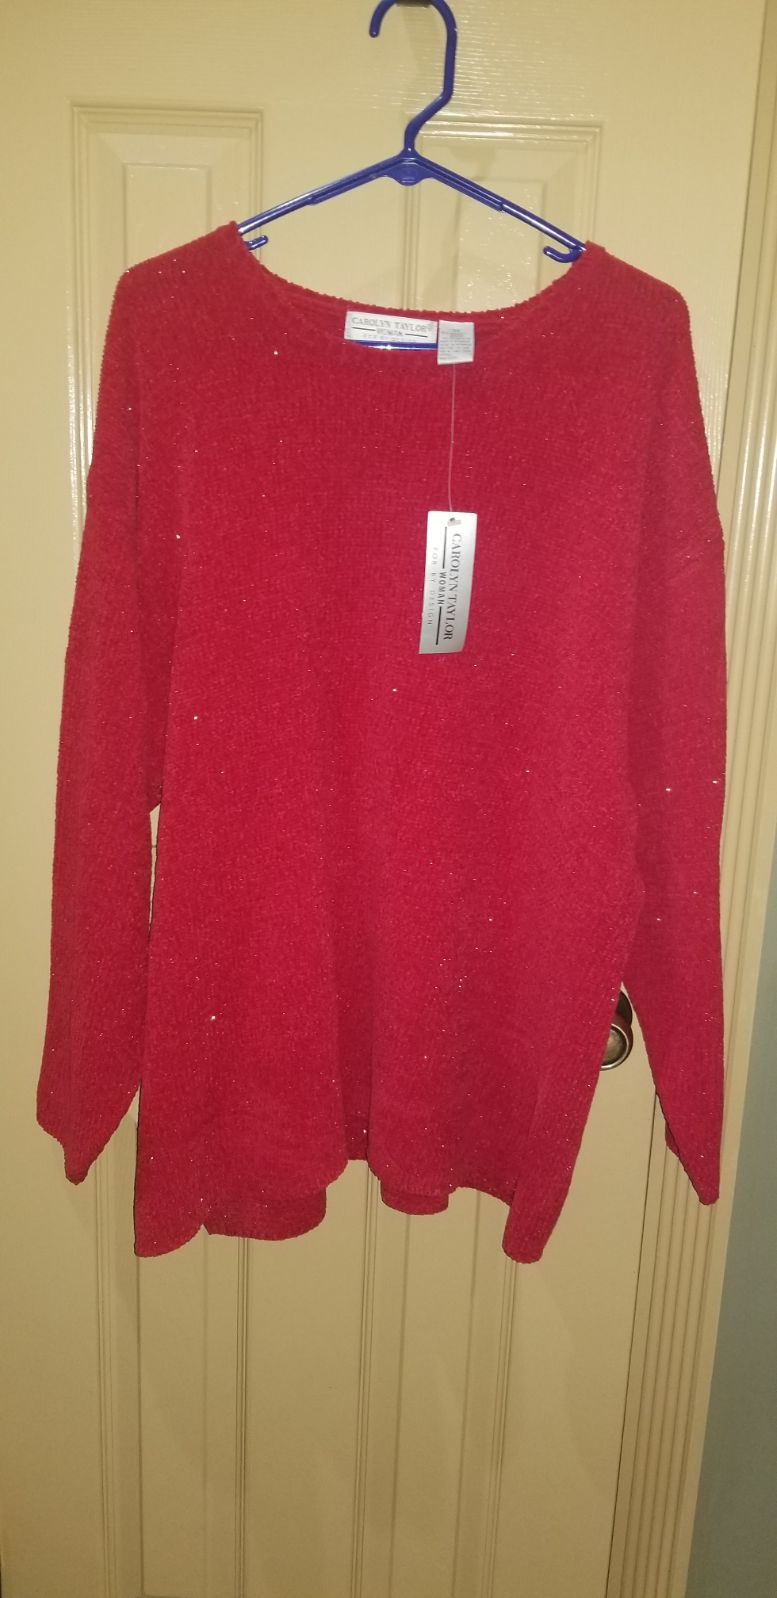 3X Carolyn Taylor sweater-NWT's